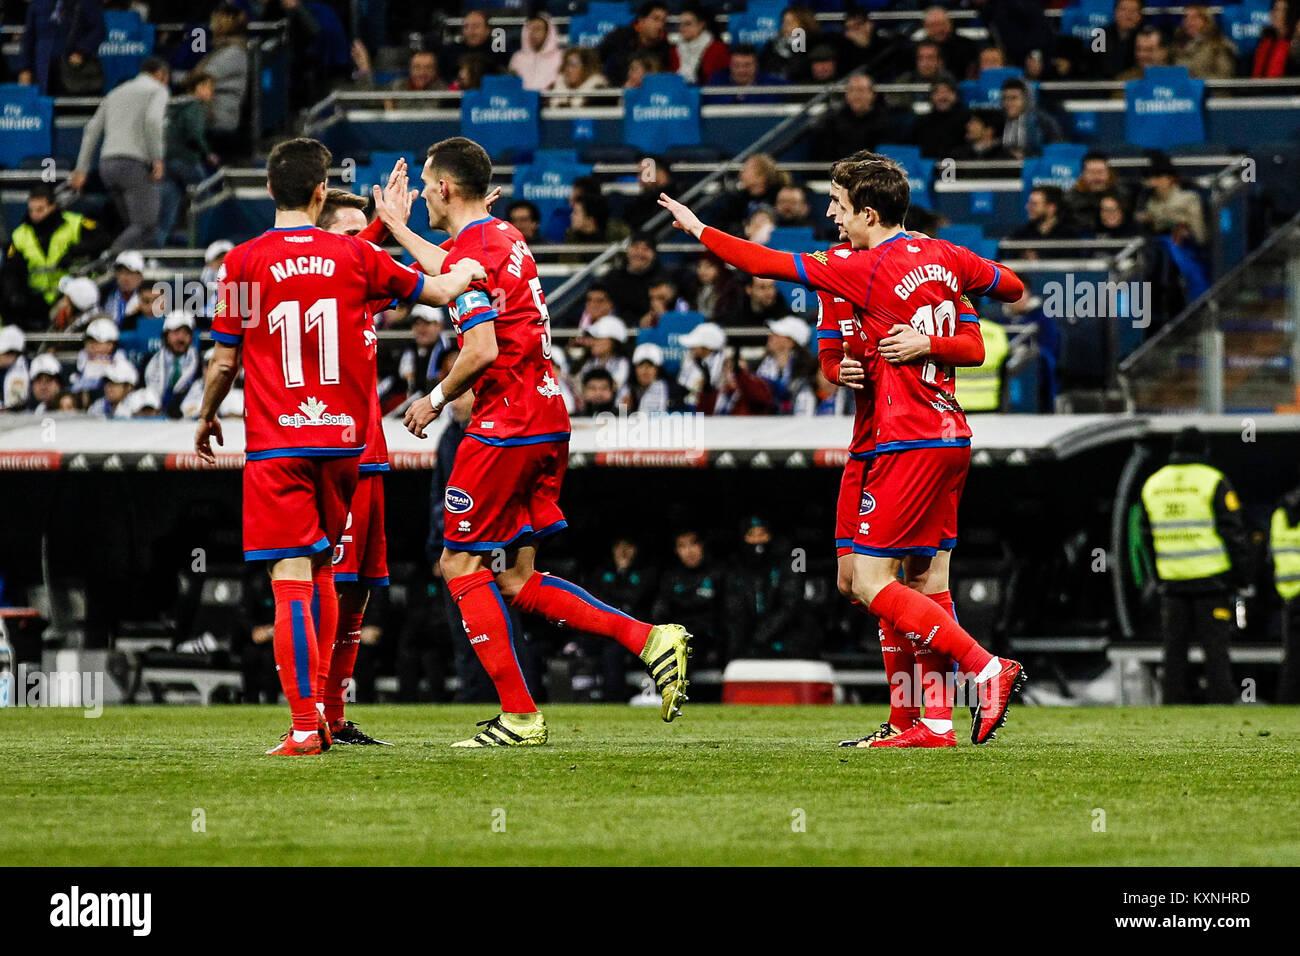 Madrid, Spain. 10th Jan, 2018. Guillermo Fernandez (Numancia) celebrates his goal which made it (1, 1) Copa del - Stock Image